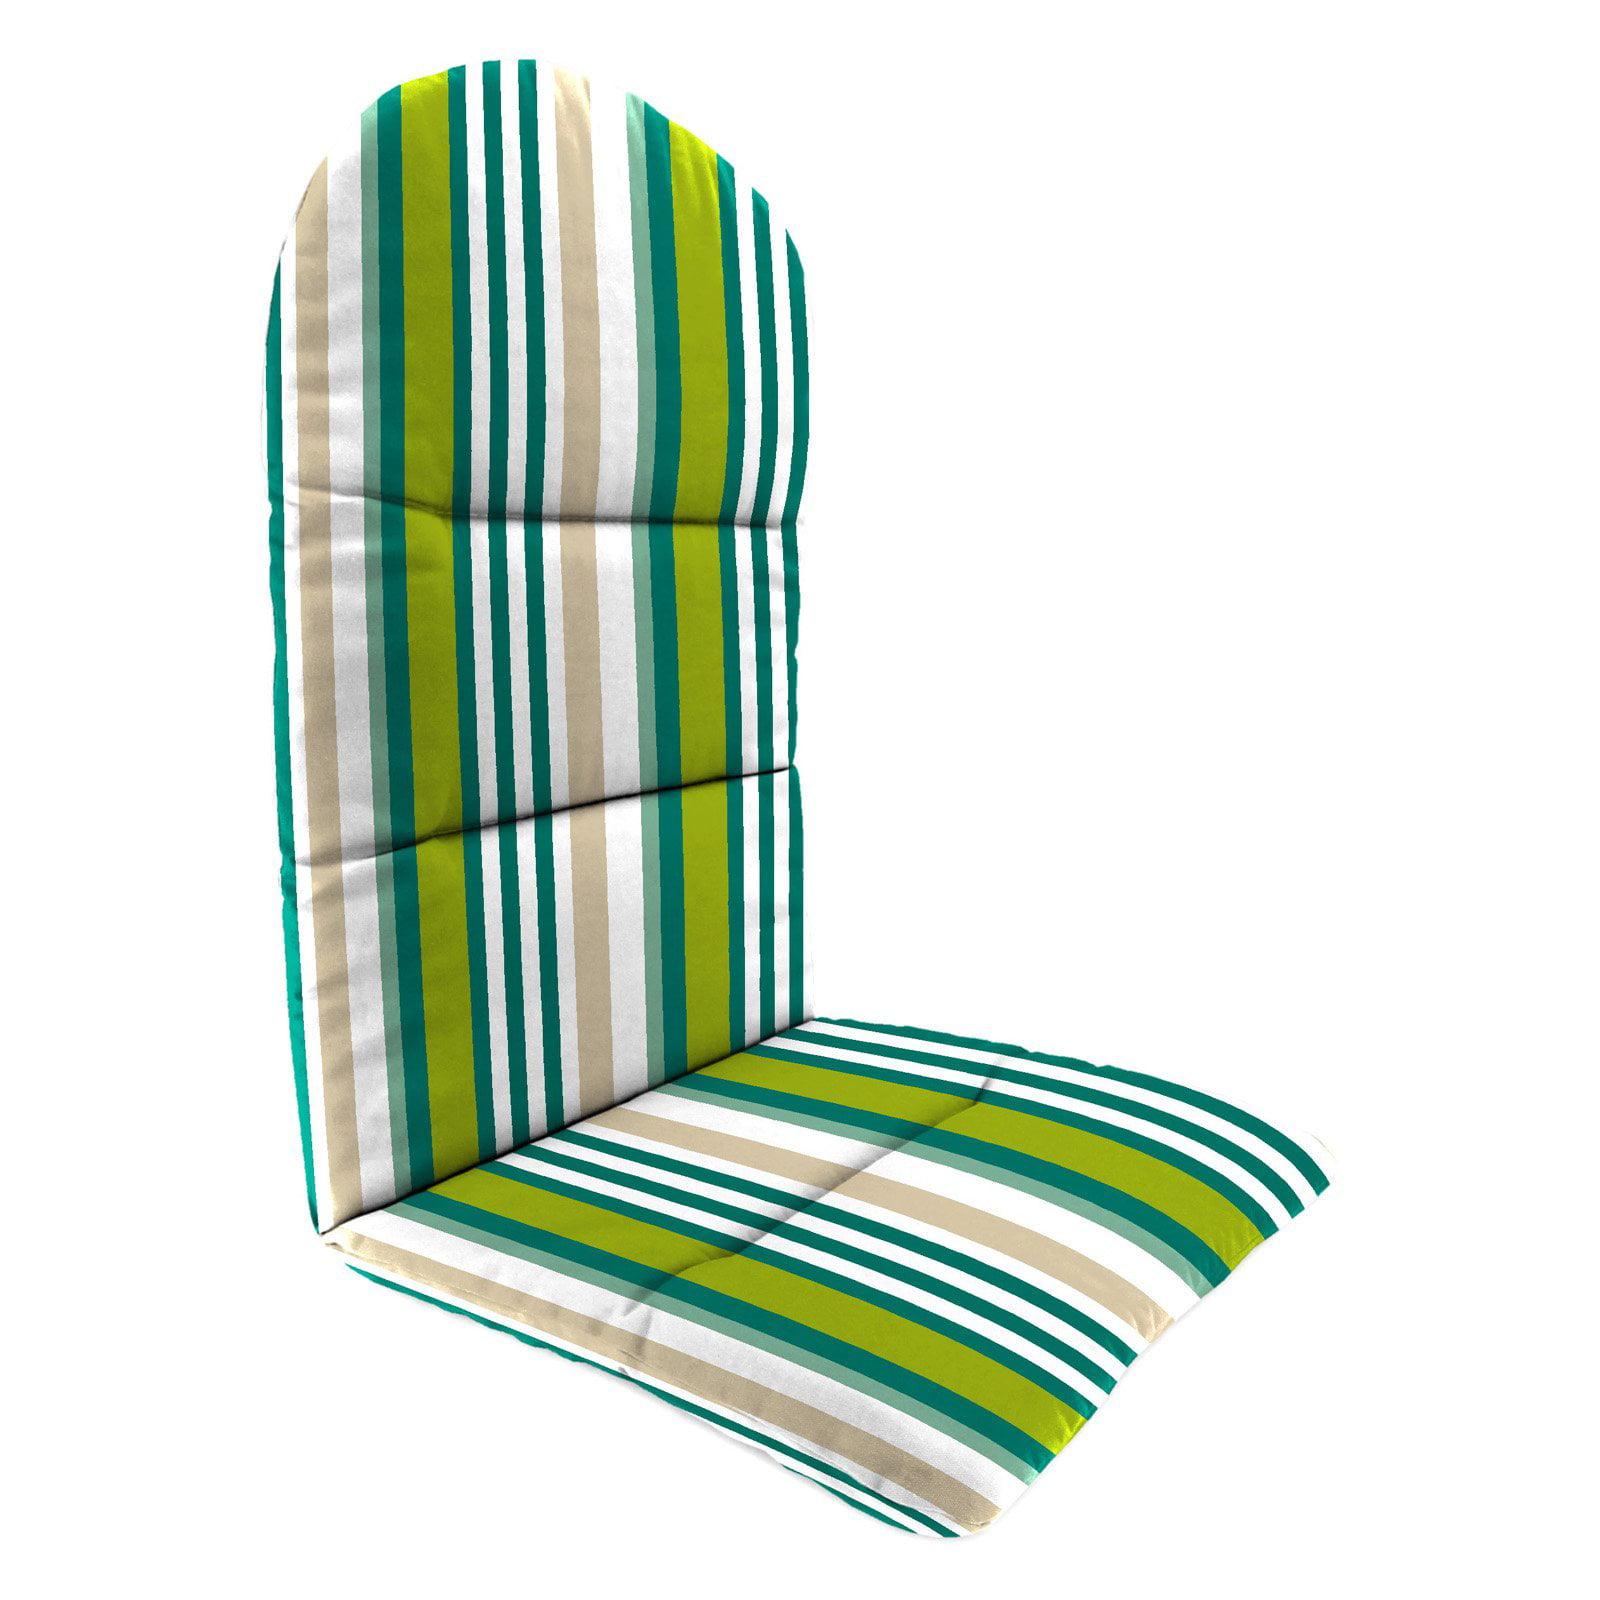 Jordan Manufacturing 49 in. Knife Edge Outdoor Adirondack Chair Cushion - Kastel